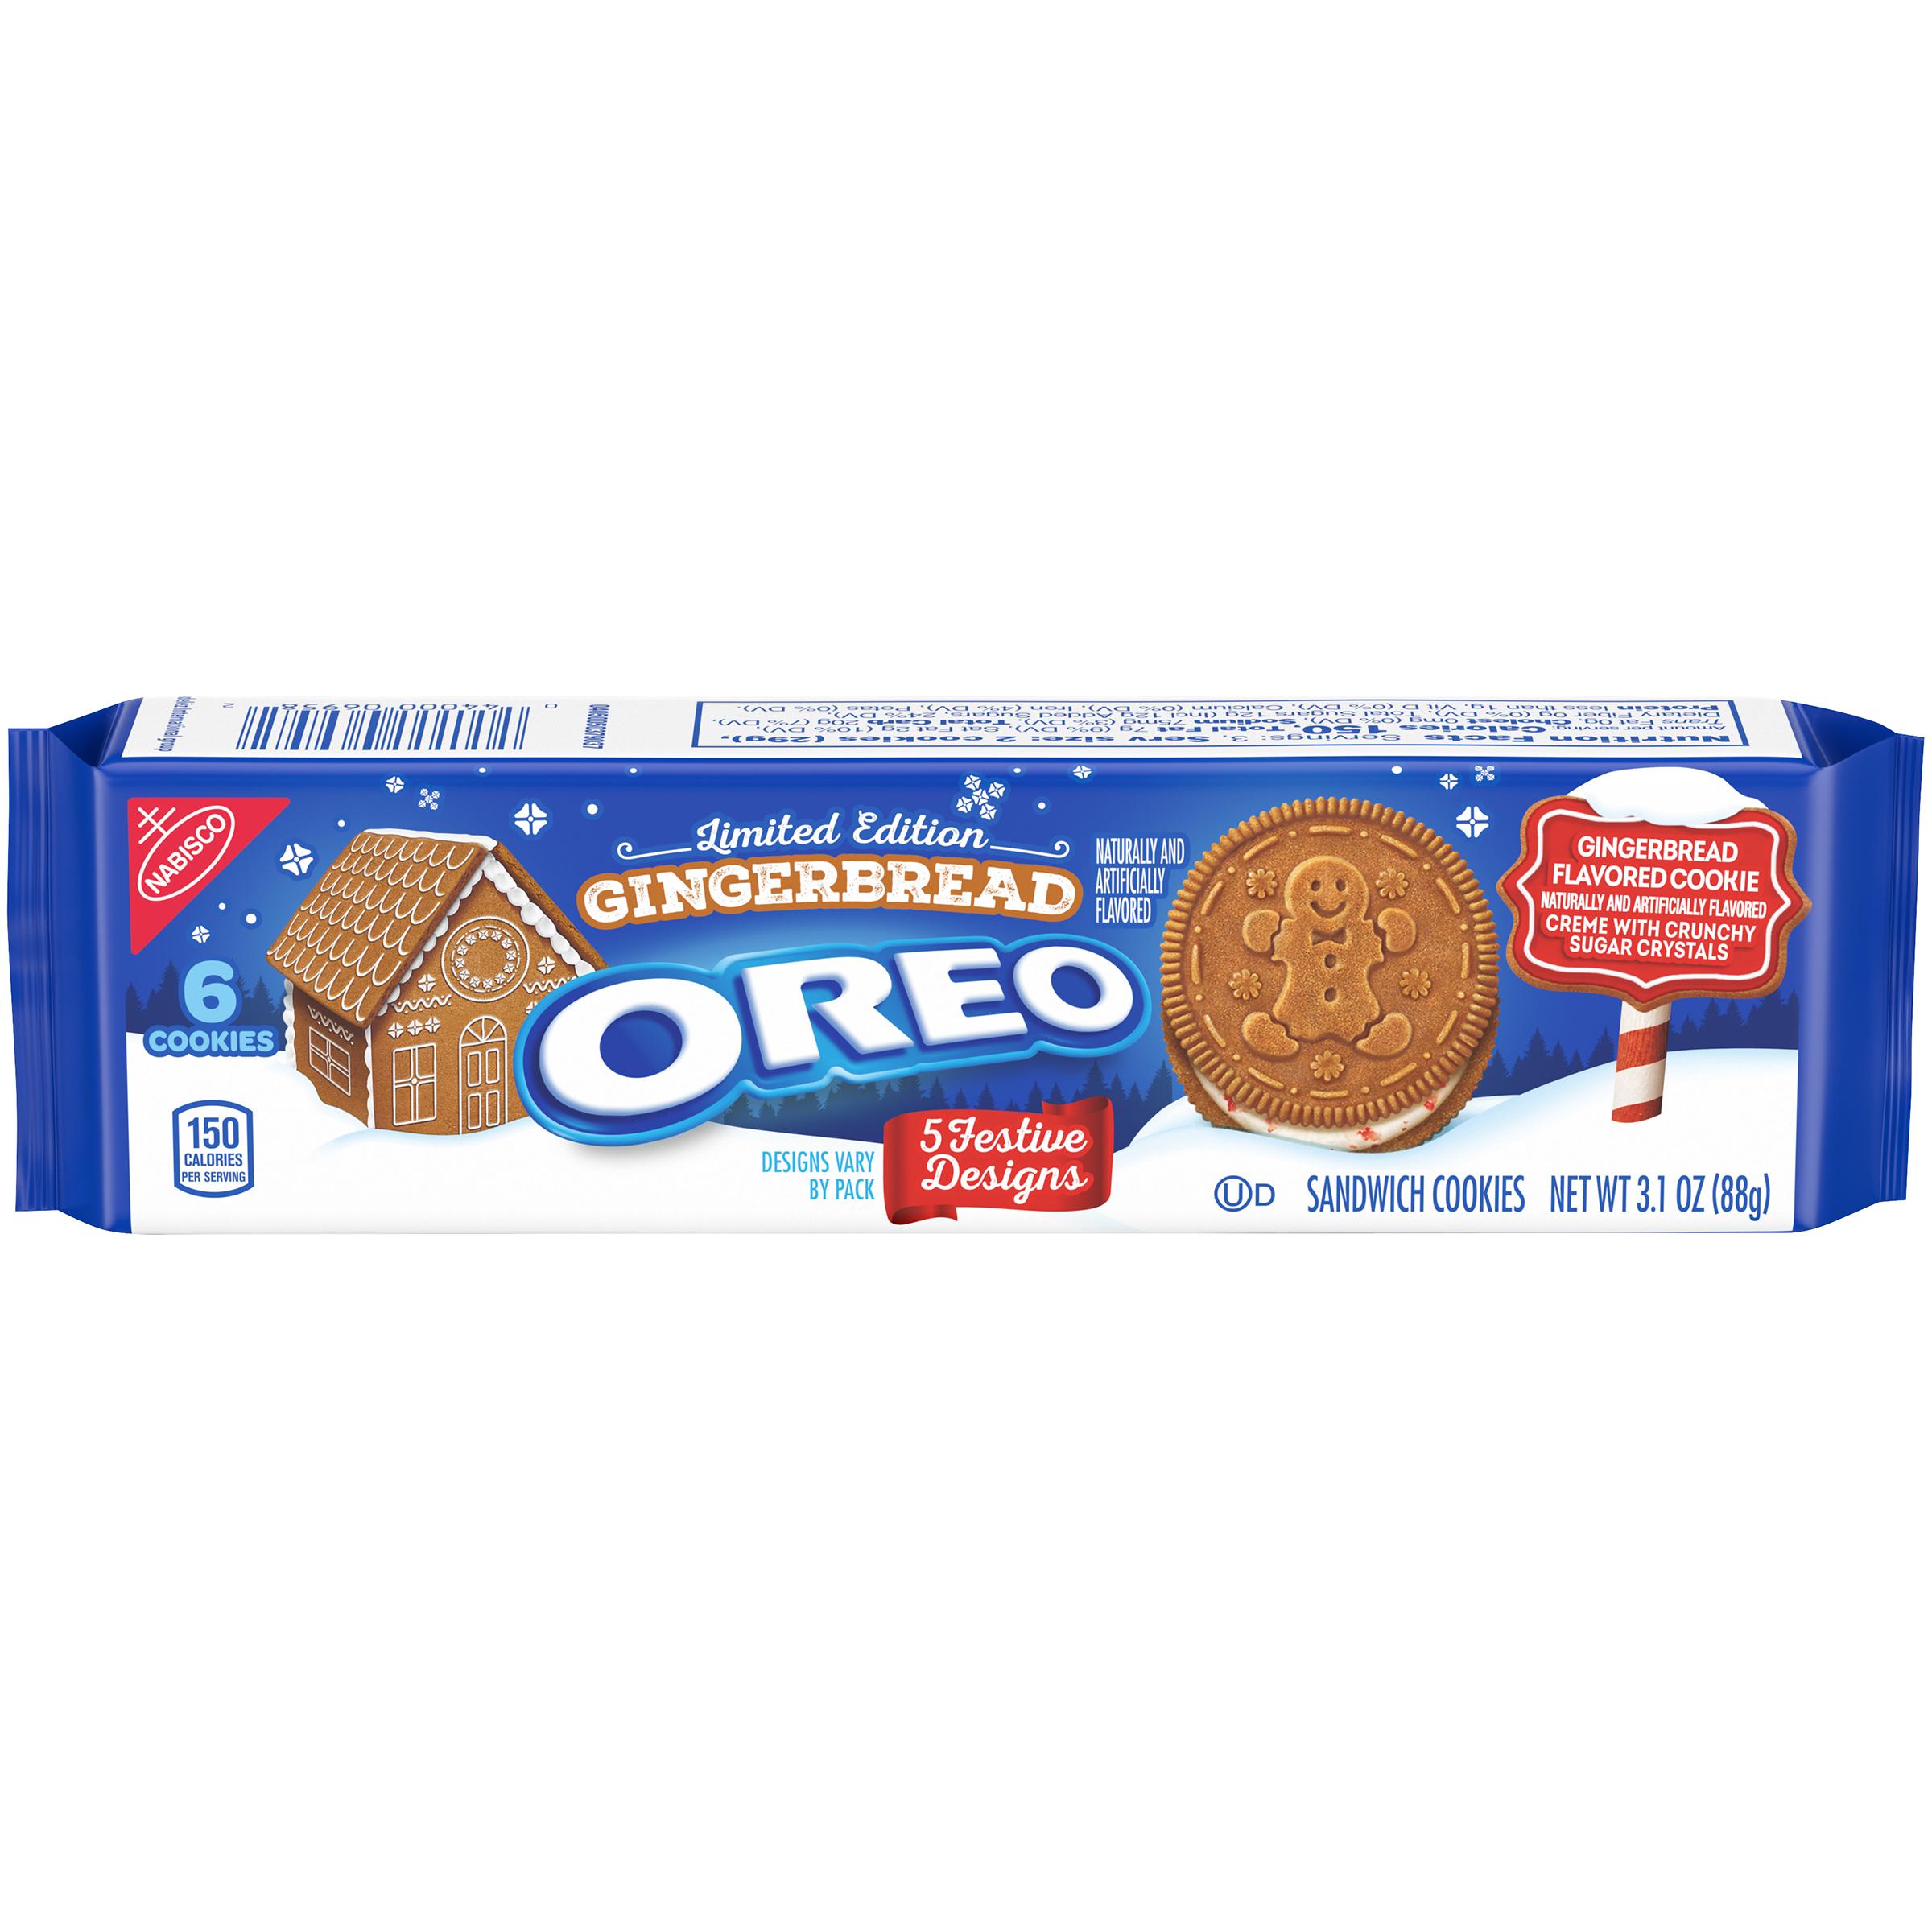 OREO Gingerbread Cookies-Single Serve 3.1 Oz